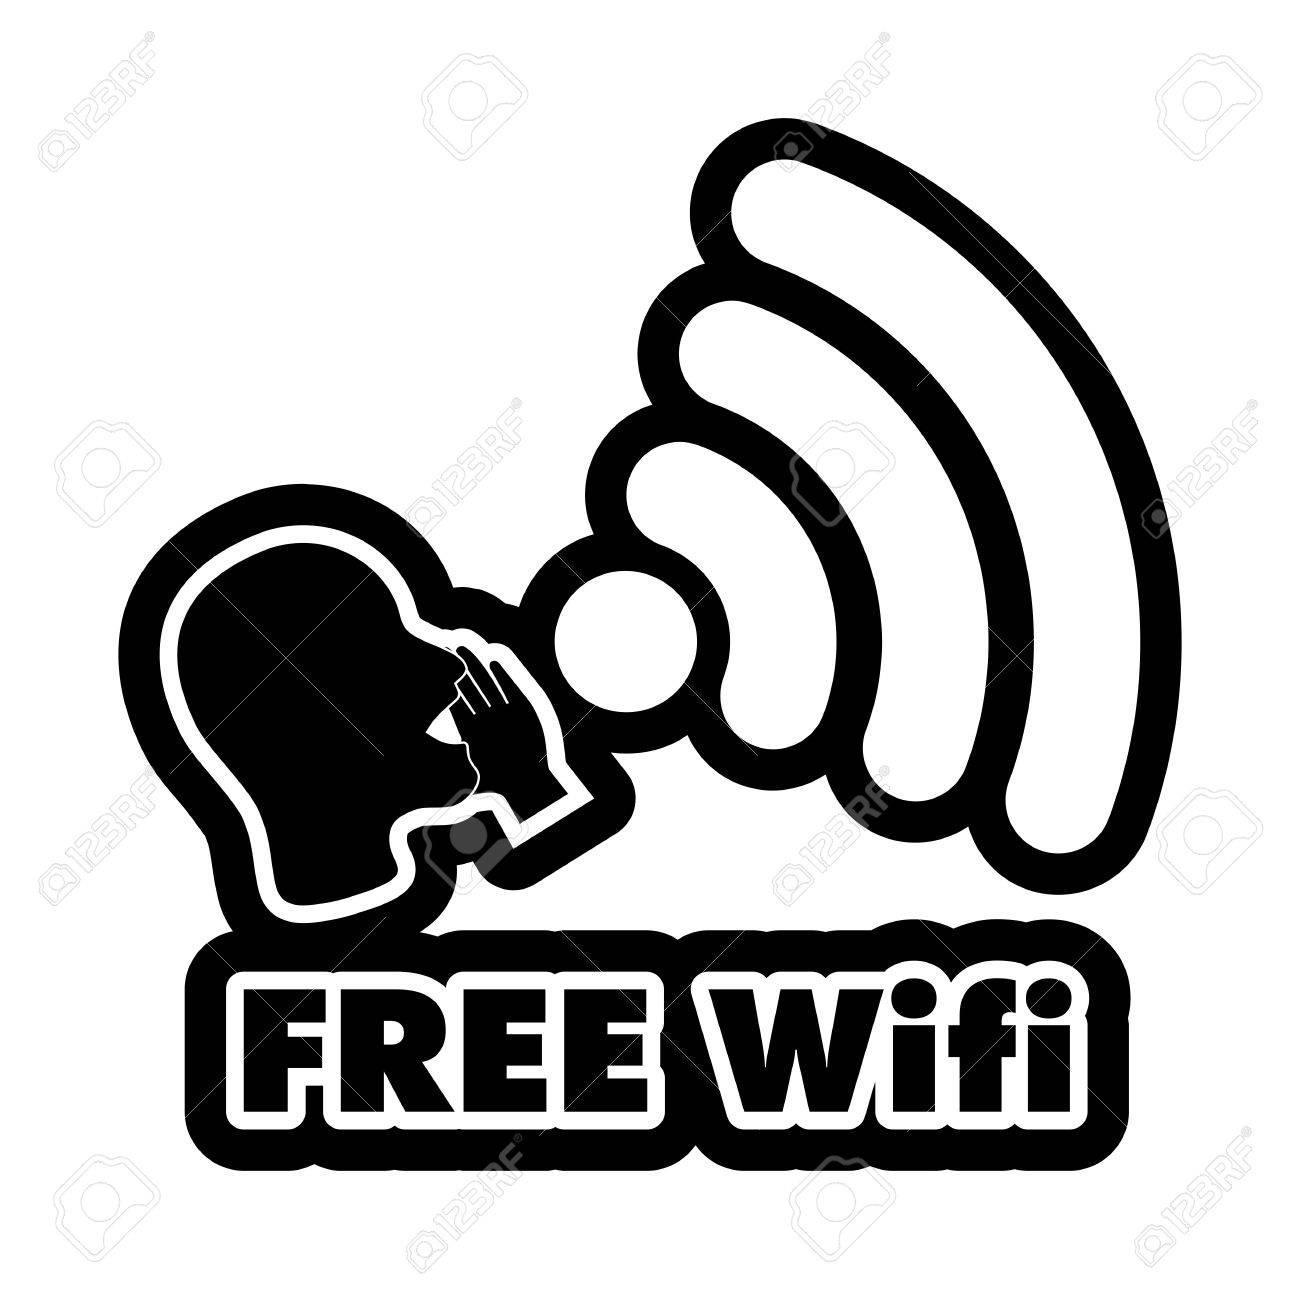 free wifi vector illustration sticker all main elements are rh 123rf com free wifi login page free wifi login for xfinity